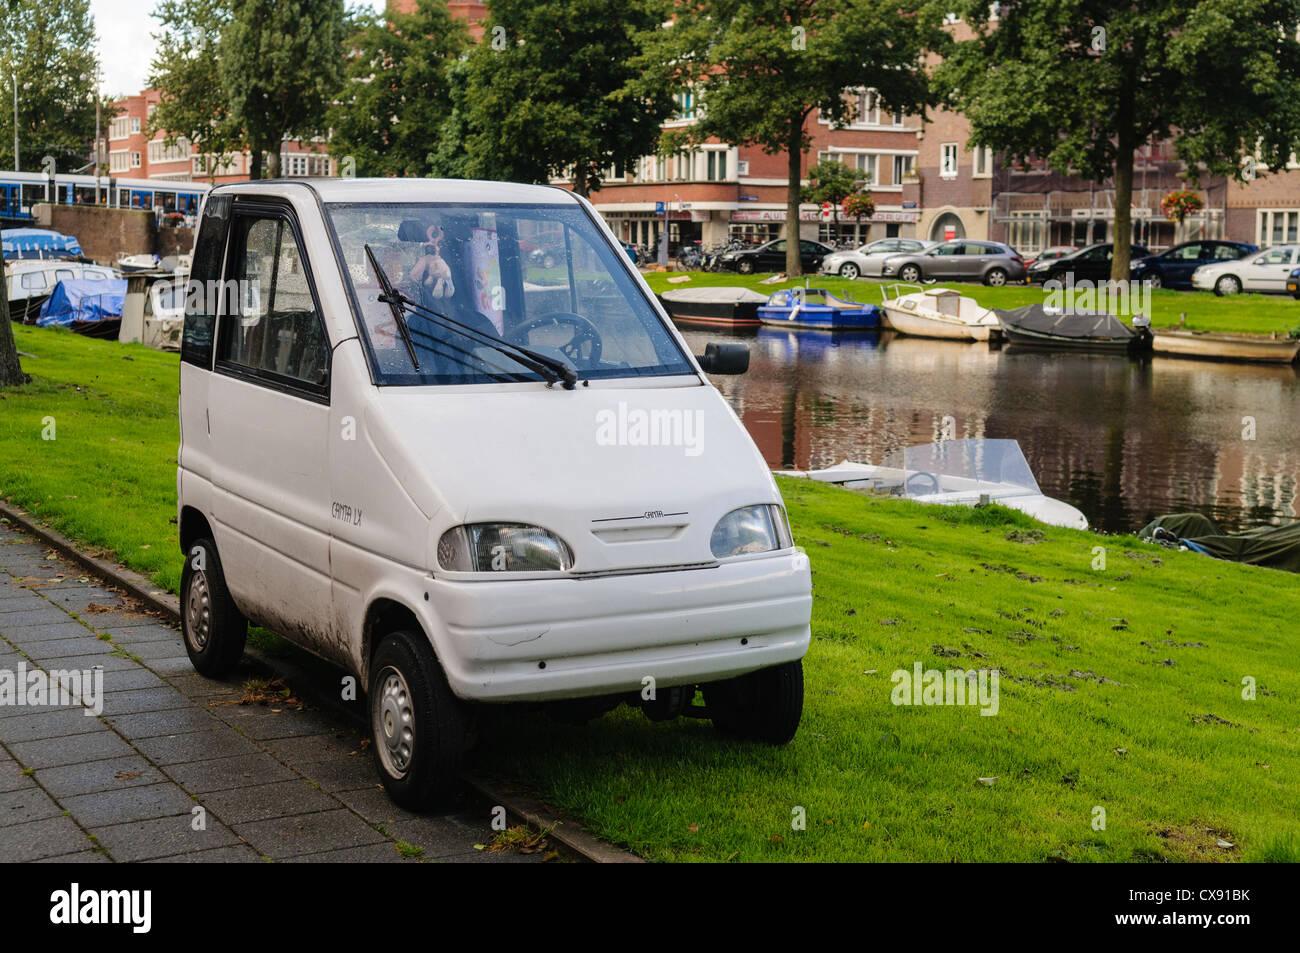 Waaijenberg Canta Lx Microcar In Amsterdam Stock Photo Royalty